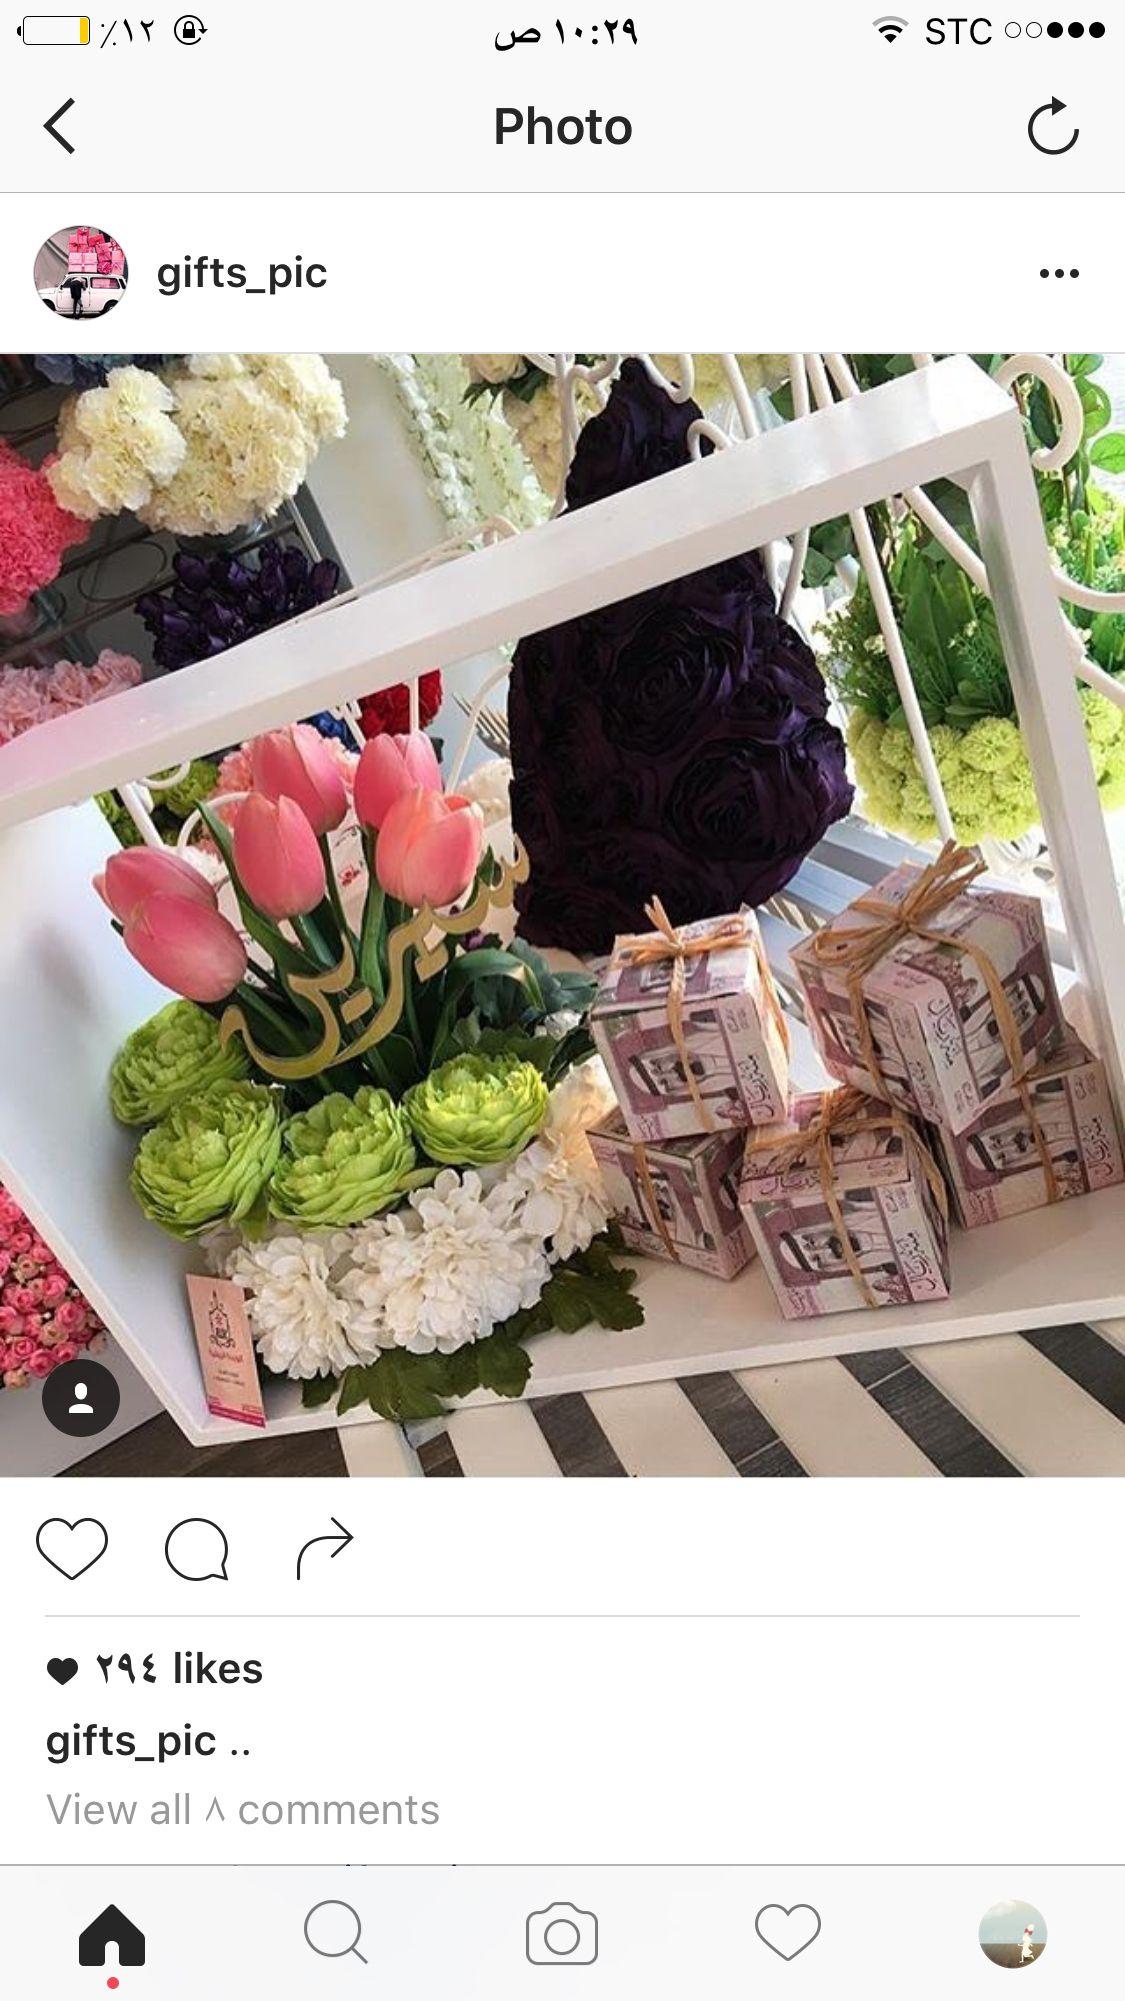 Dailyroses ورد ورد صناعي ورد طبيعي بوكيه ورد فازات فازات ورد تنسيق ورد خشبيات بالونات Flower Gift Ideas Wedding Gifts Packaging Floral Arrangements